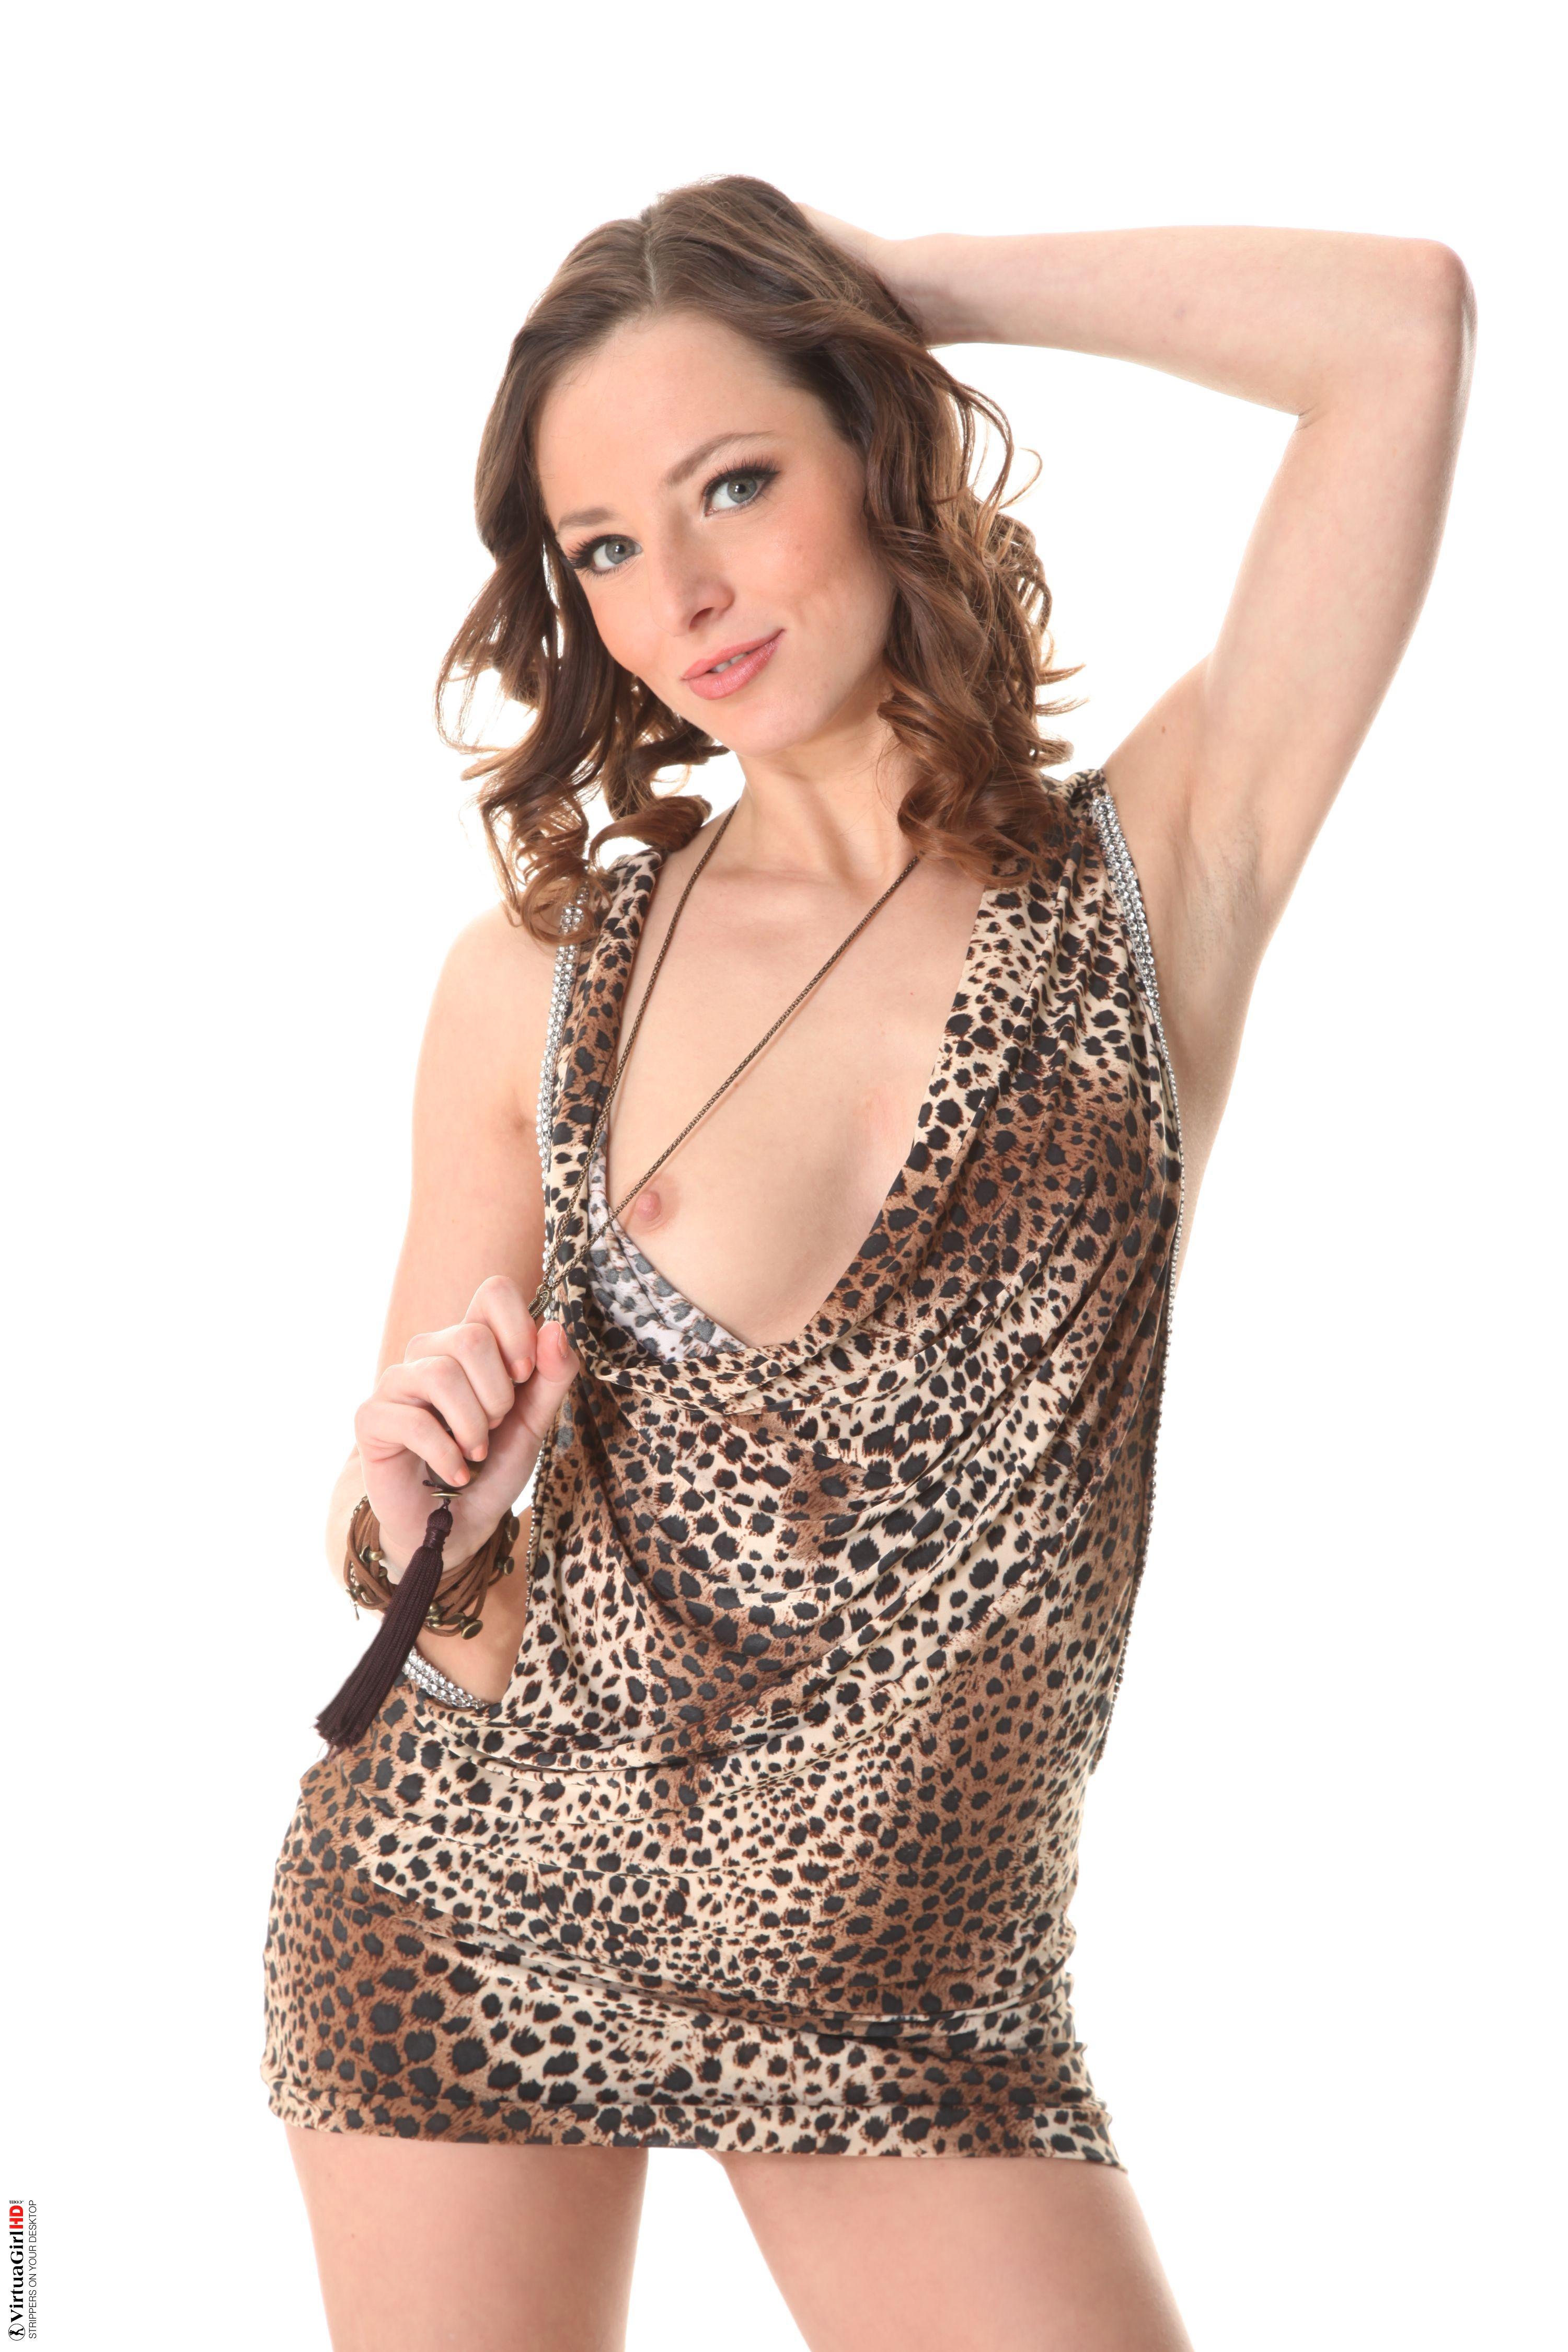 virtual girl stripper desktop